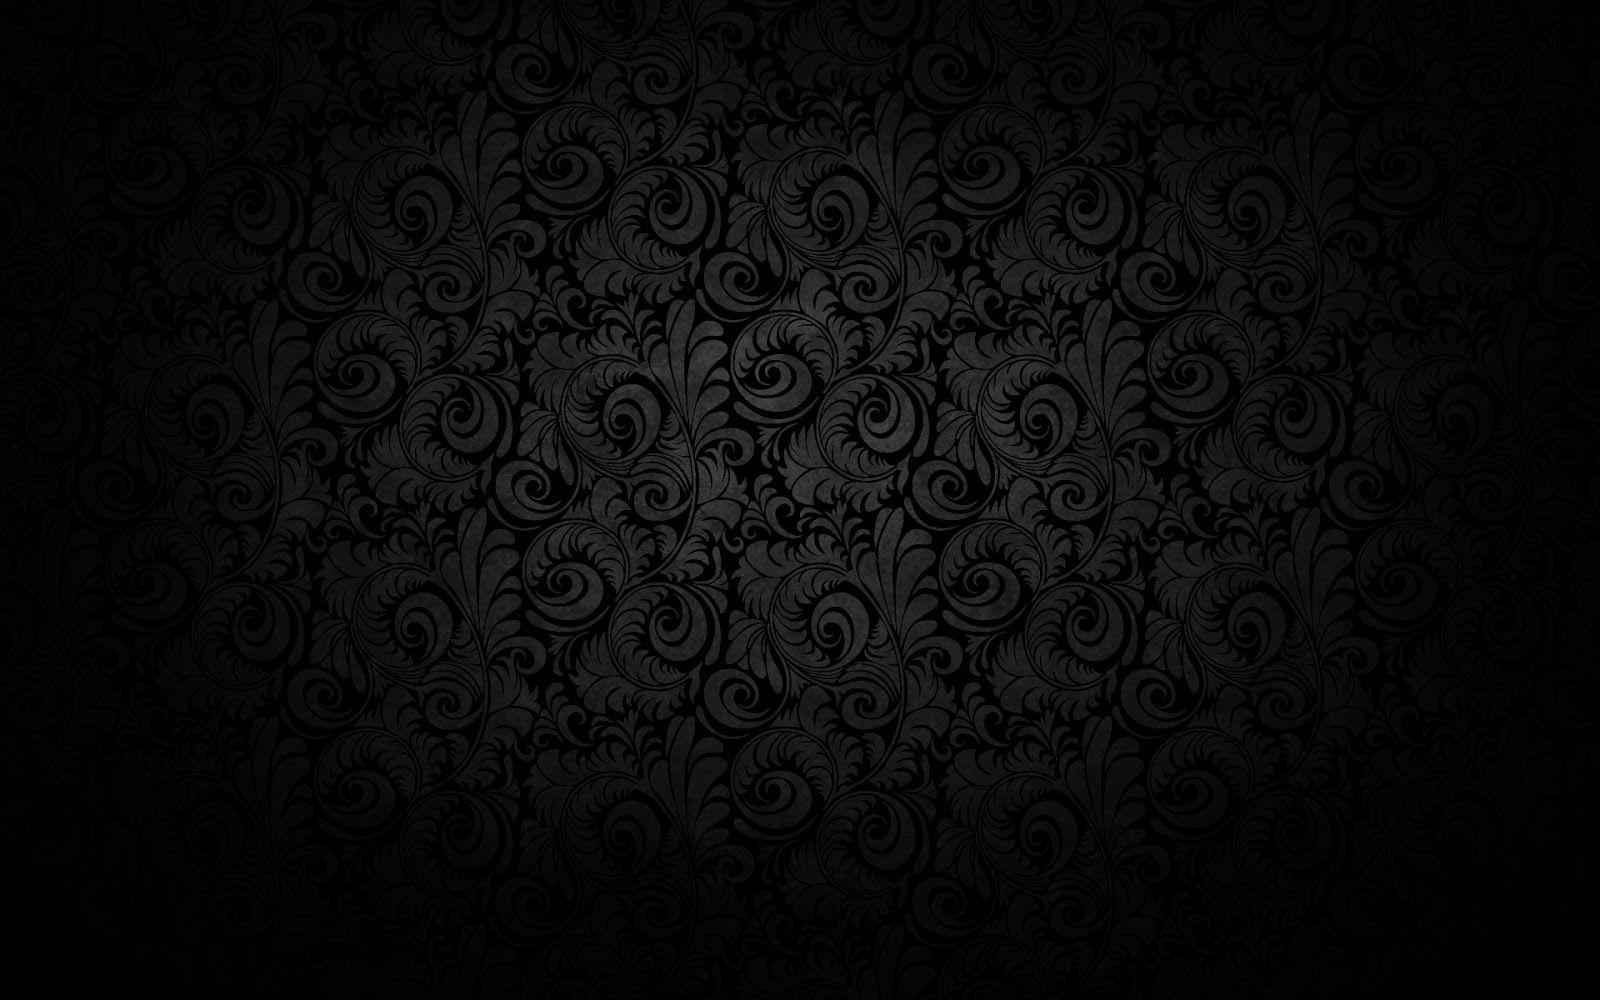 Free Dark Textured Backgrounds - Wallpaper Cave